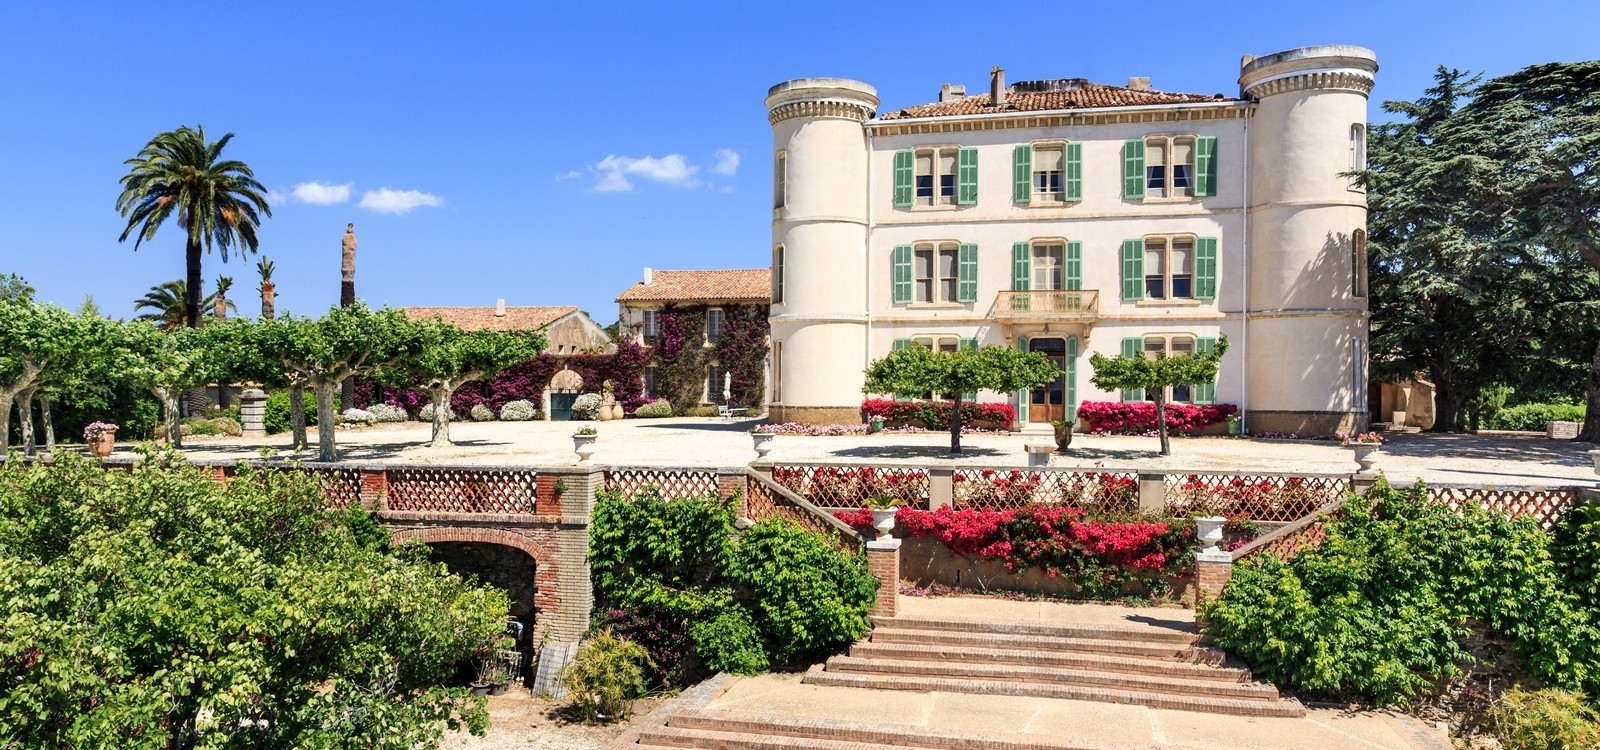 Chateau de Bregançon